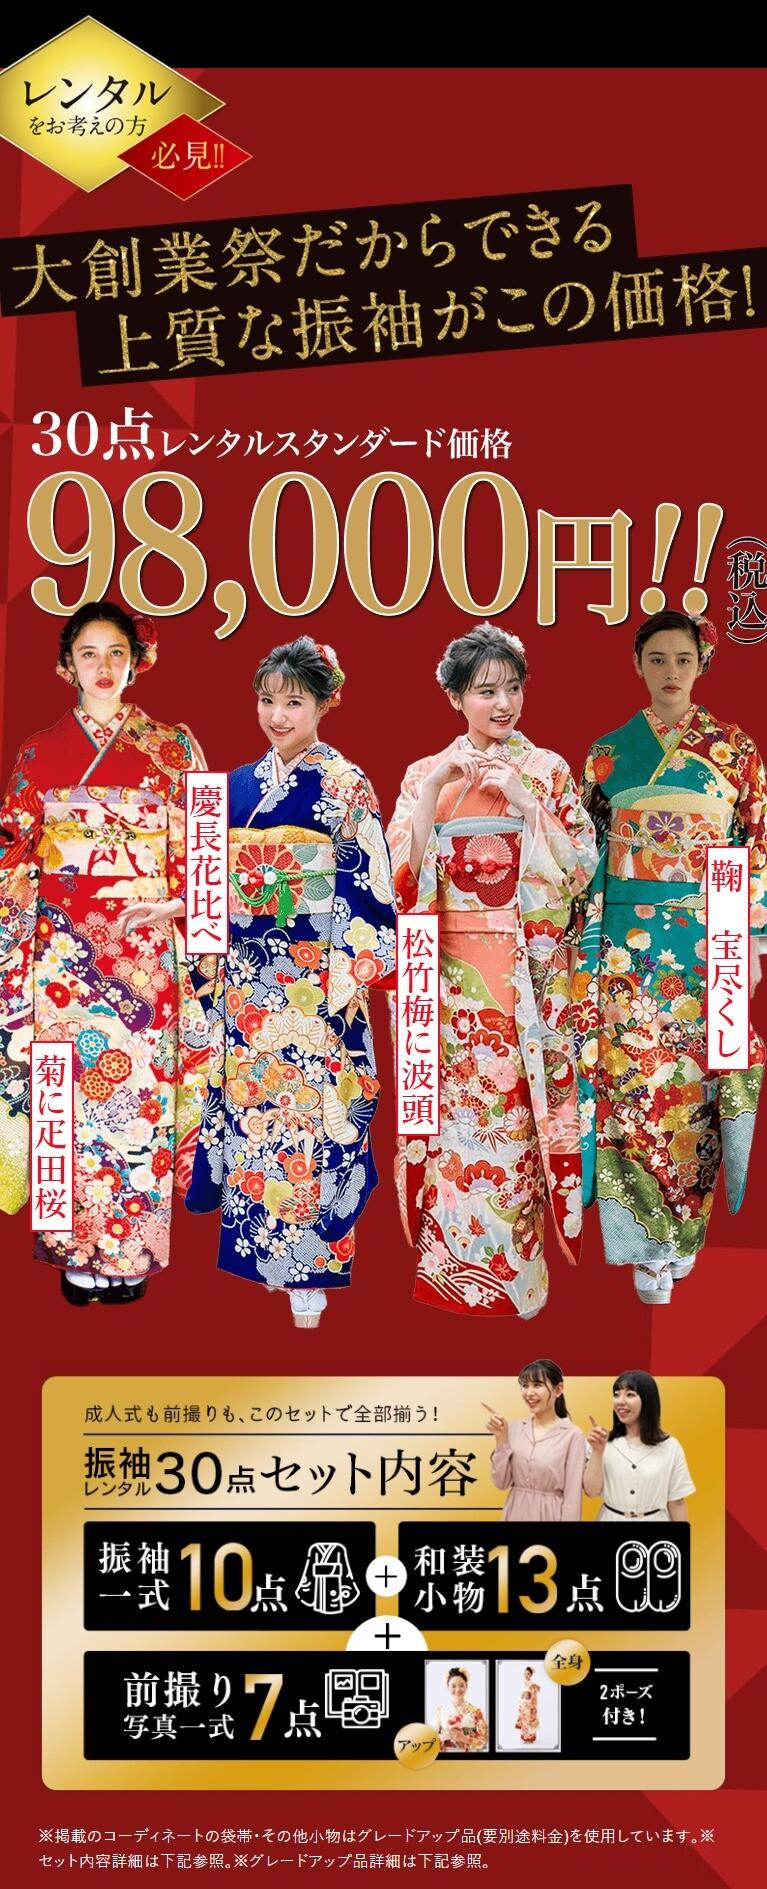 FireShot Capture 6782 - 振袖大創業祭 成人式の振袖レンタル・販売オンディーヌ - www.ondine.jp